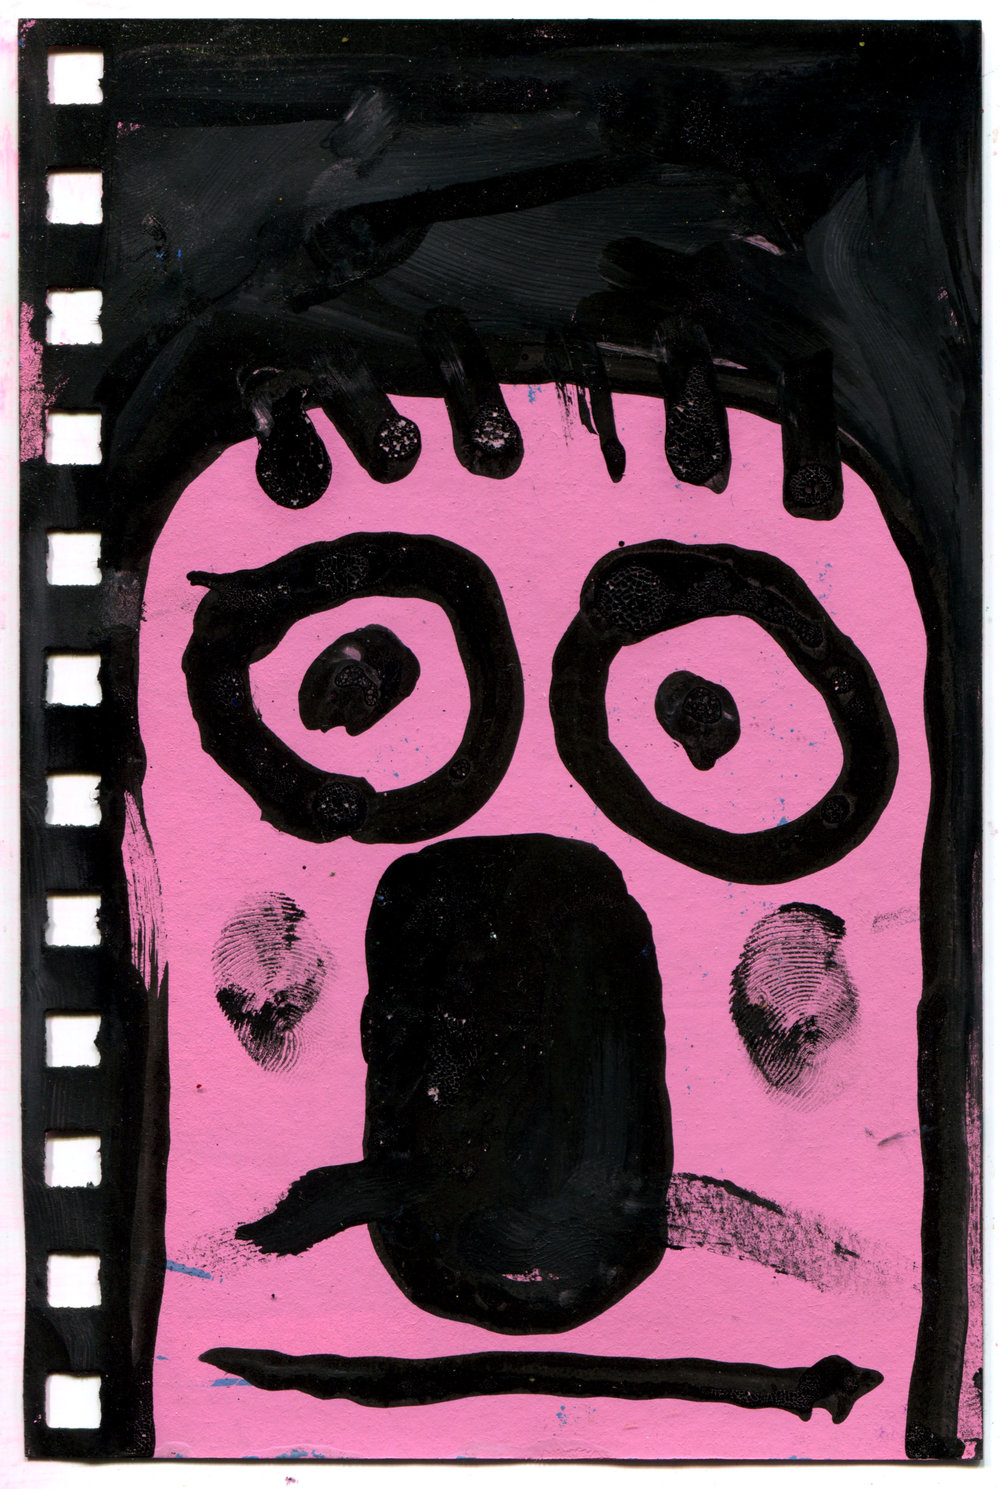 Pink Thumb Face